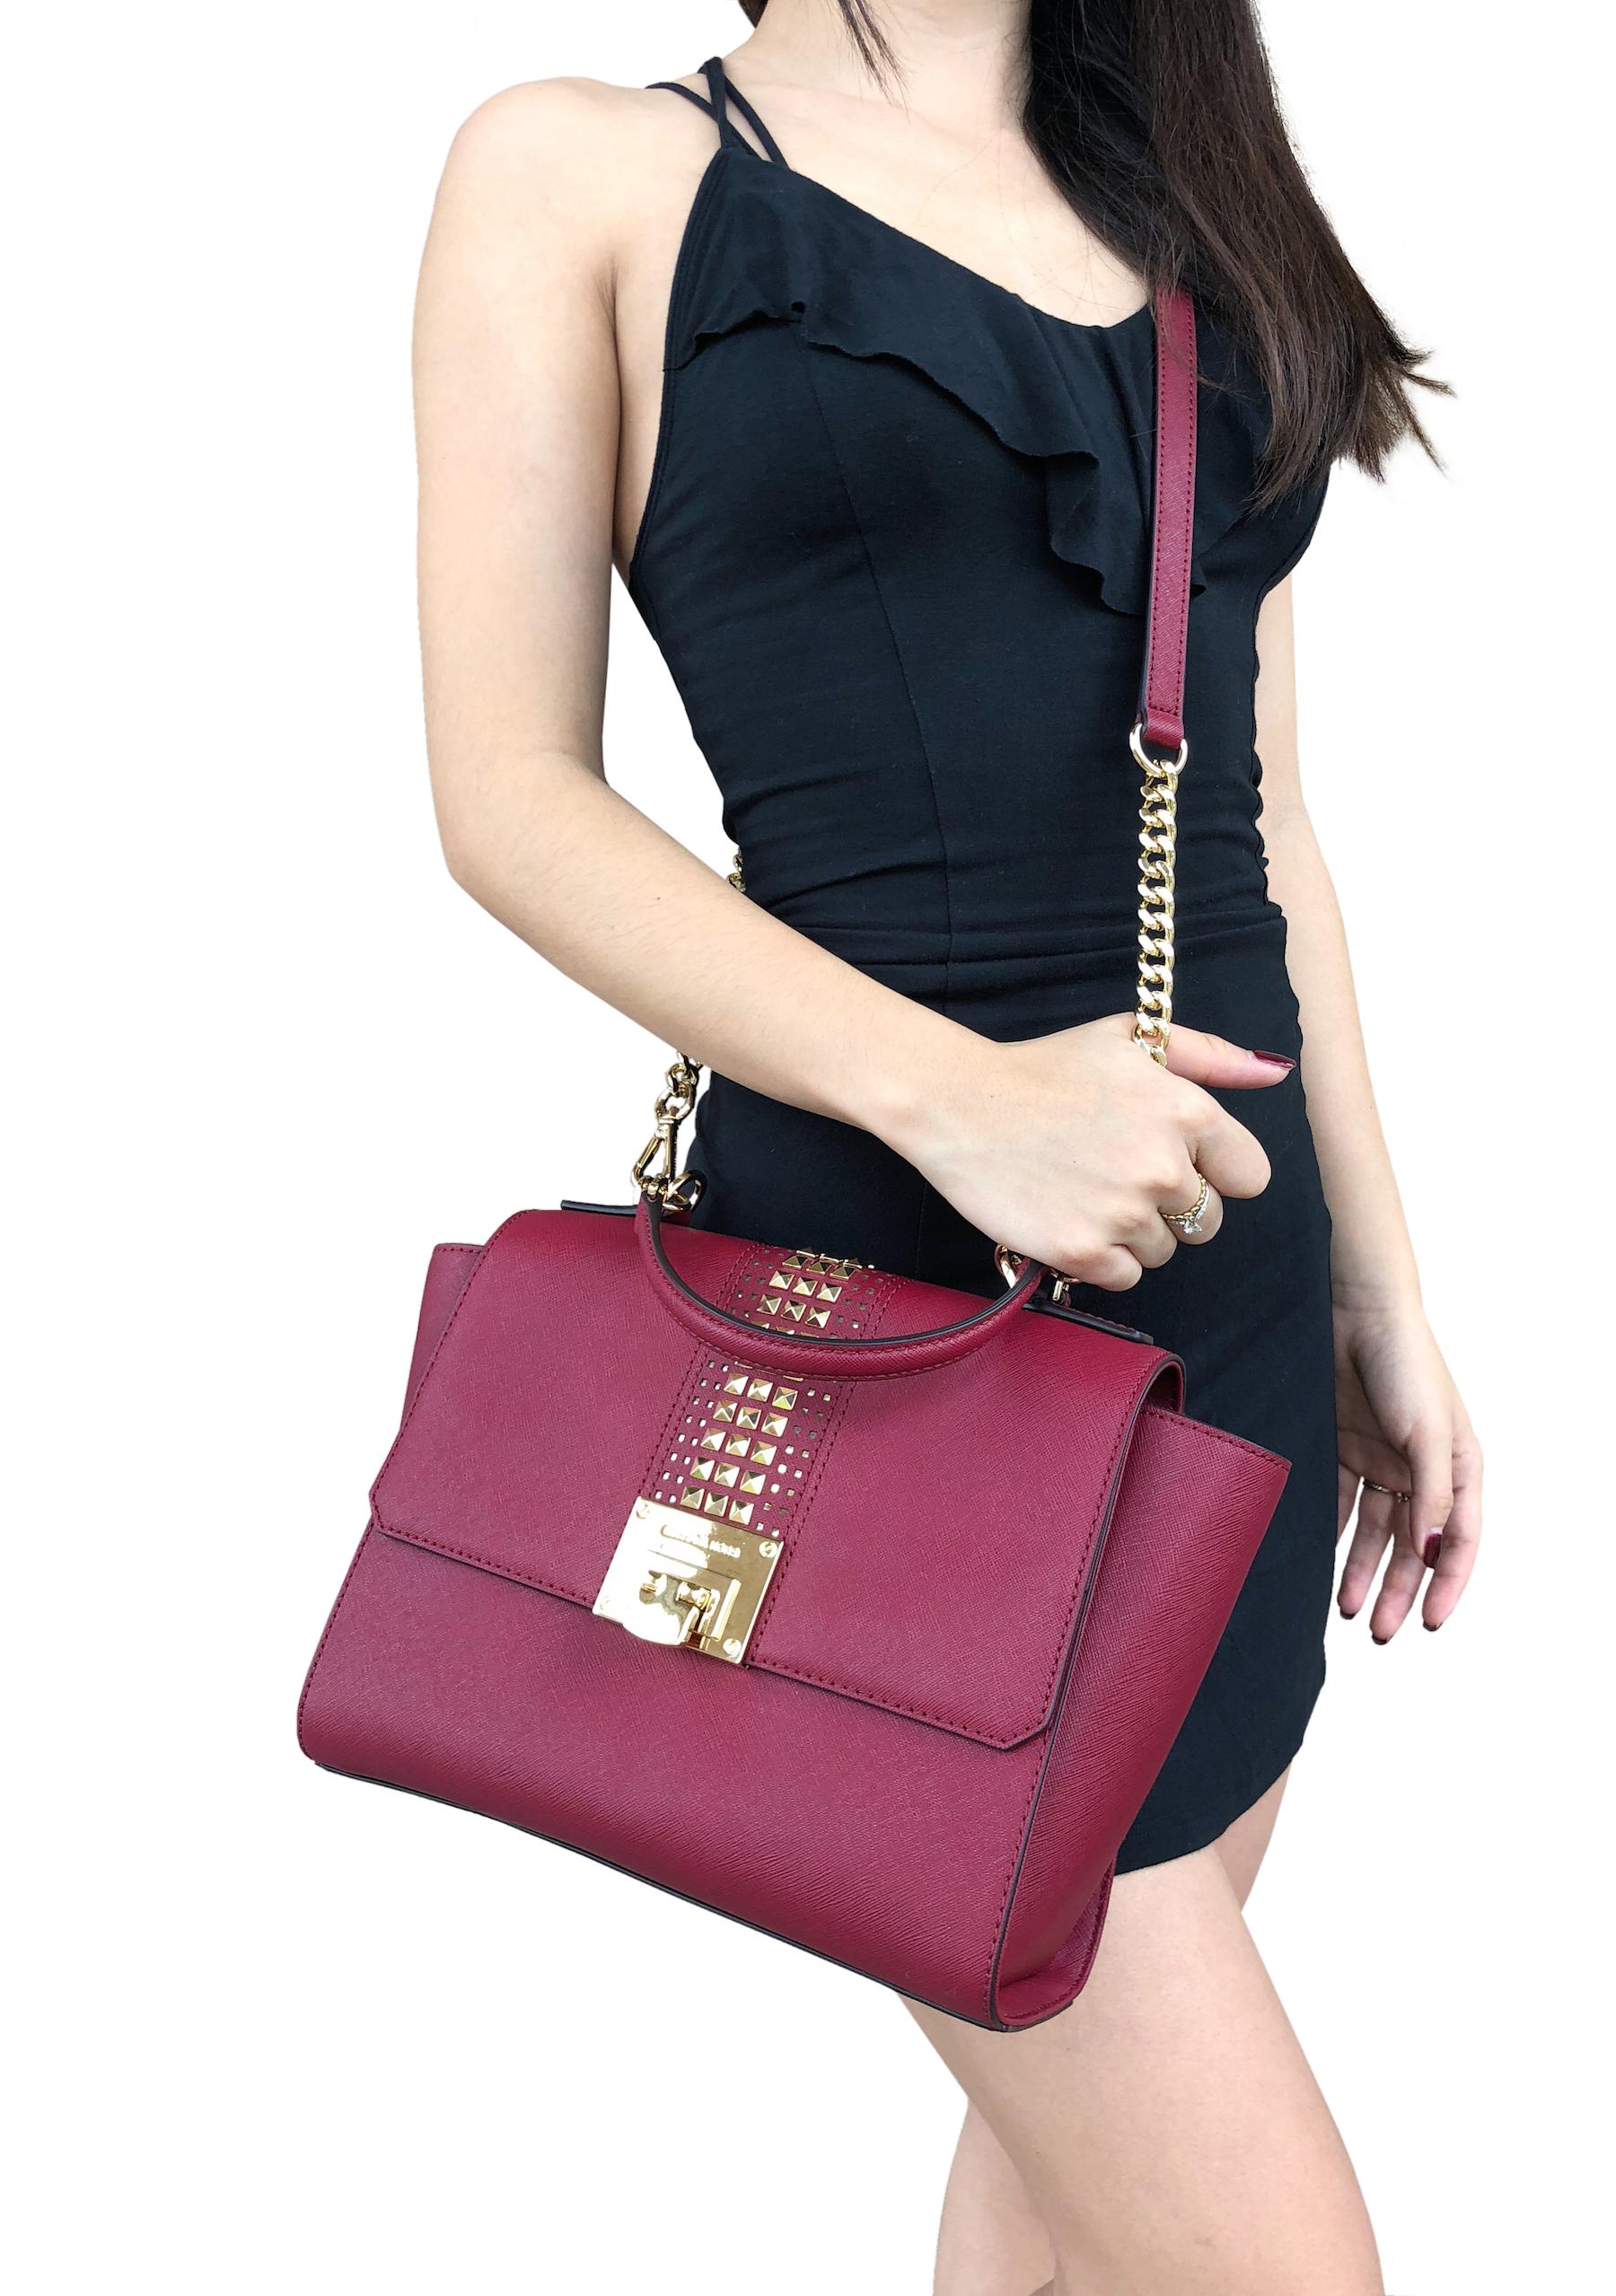 0e032013576c NWT Michael Kors Tina Studded East West Satchel Bag Flap Crossbody Cherry  Red